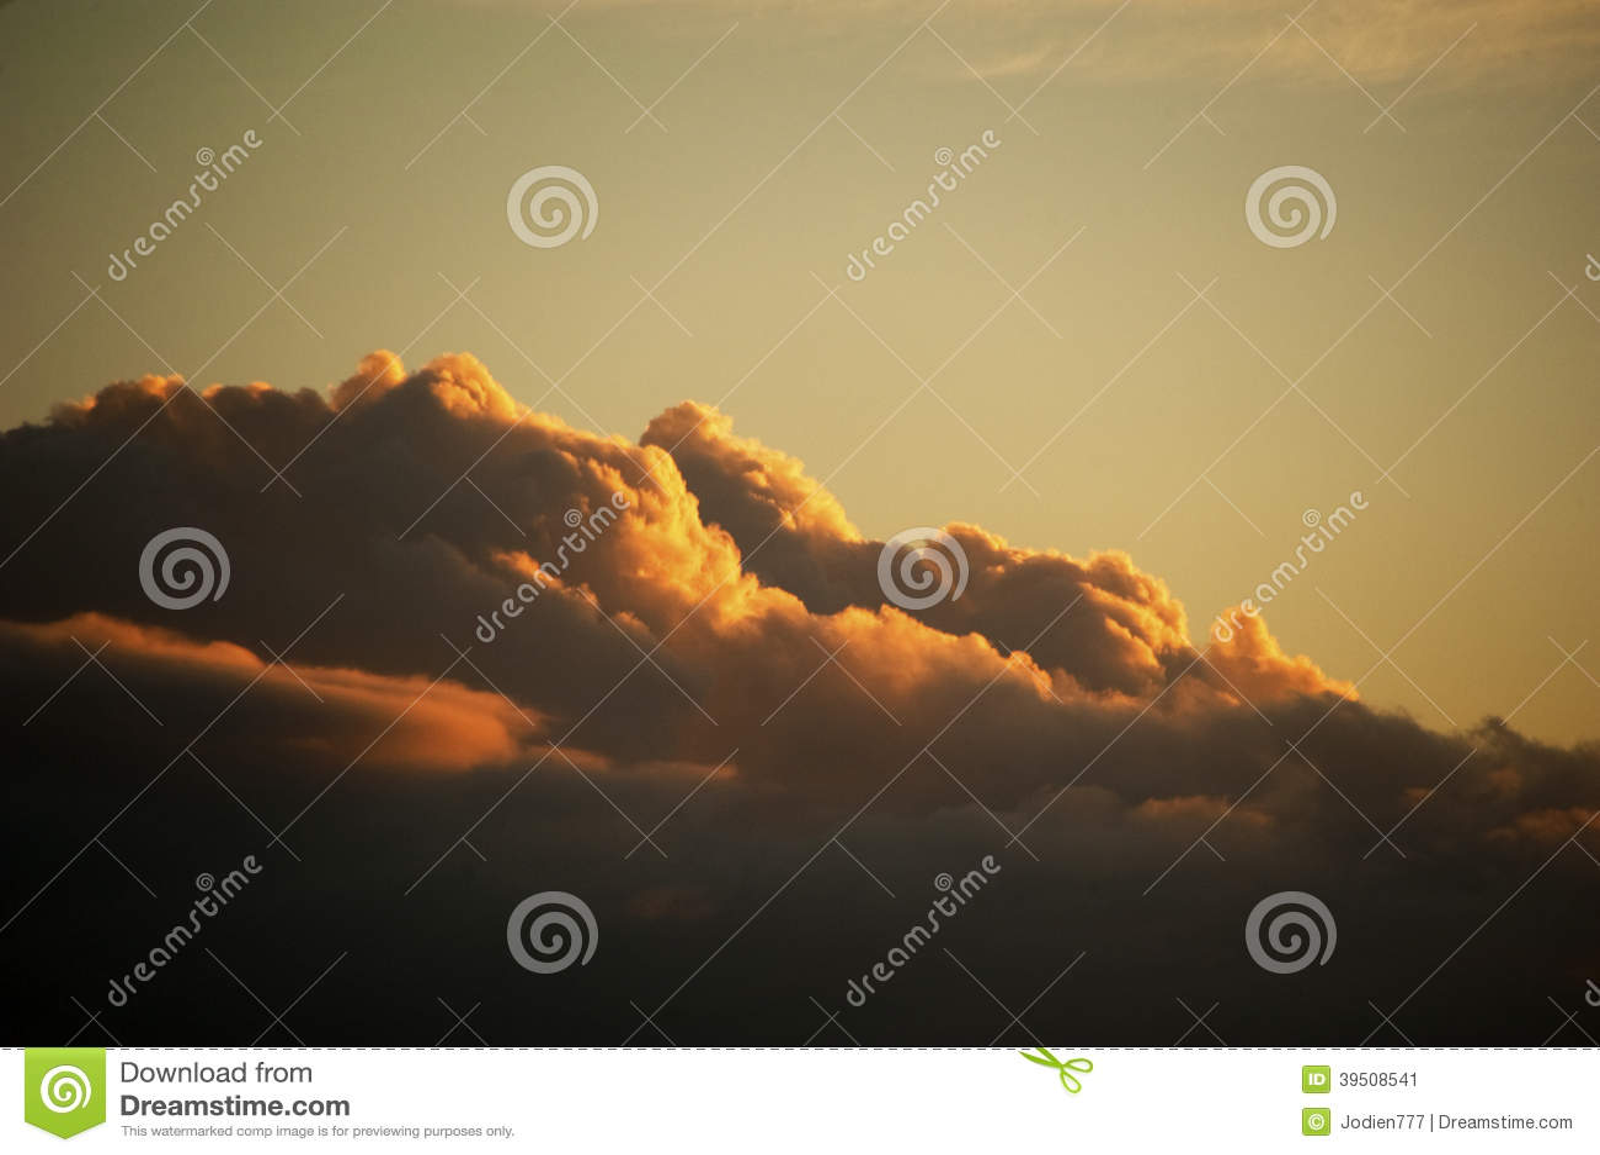 Cloud at sunrise